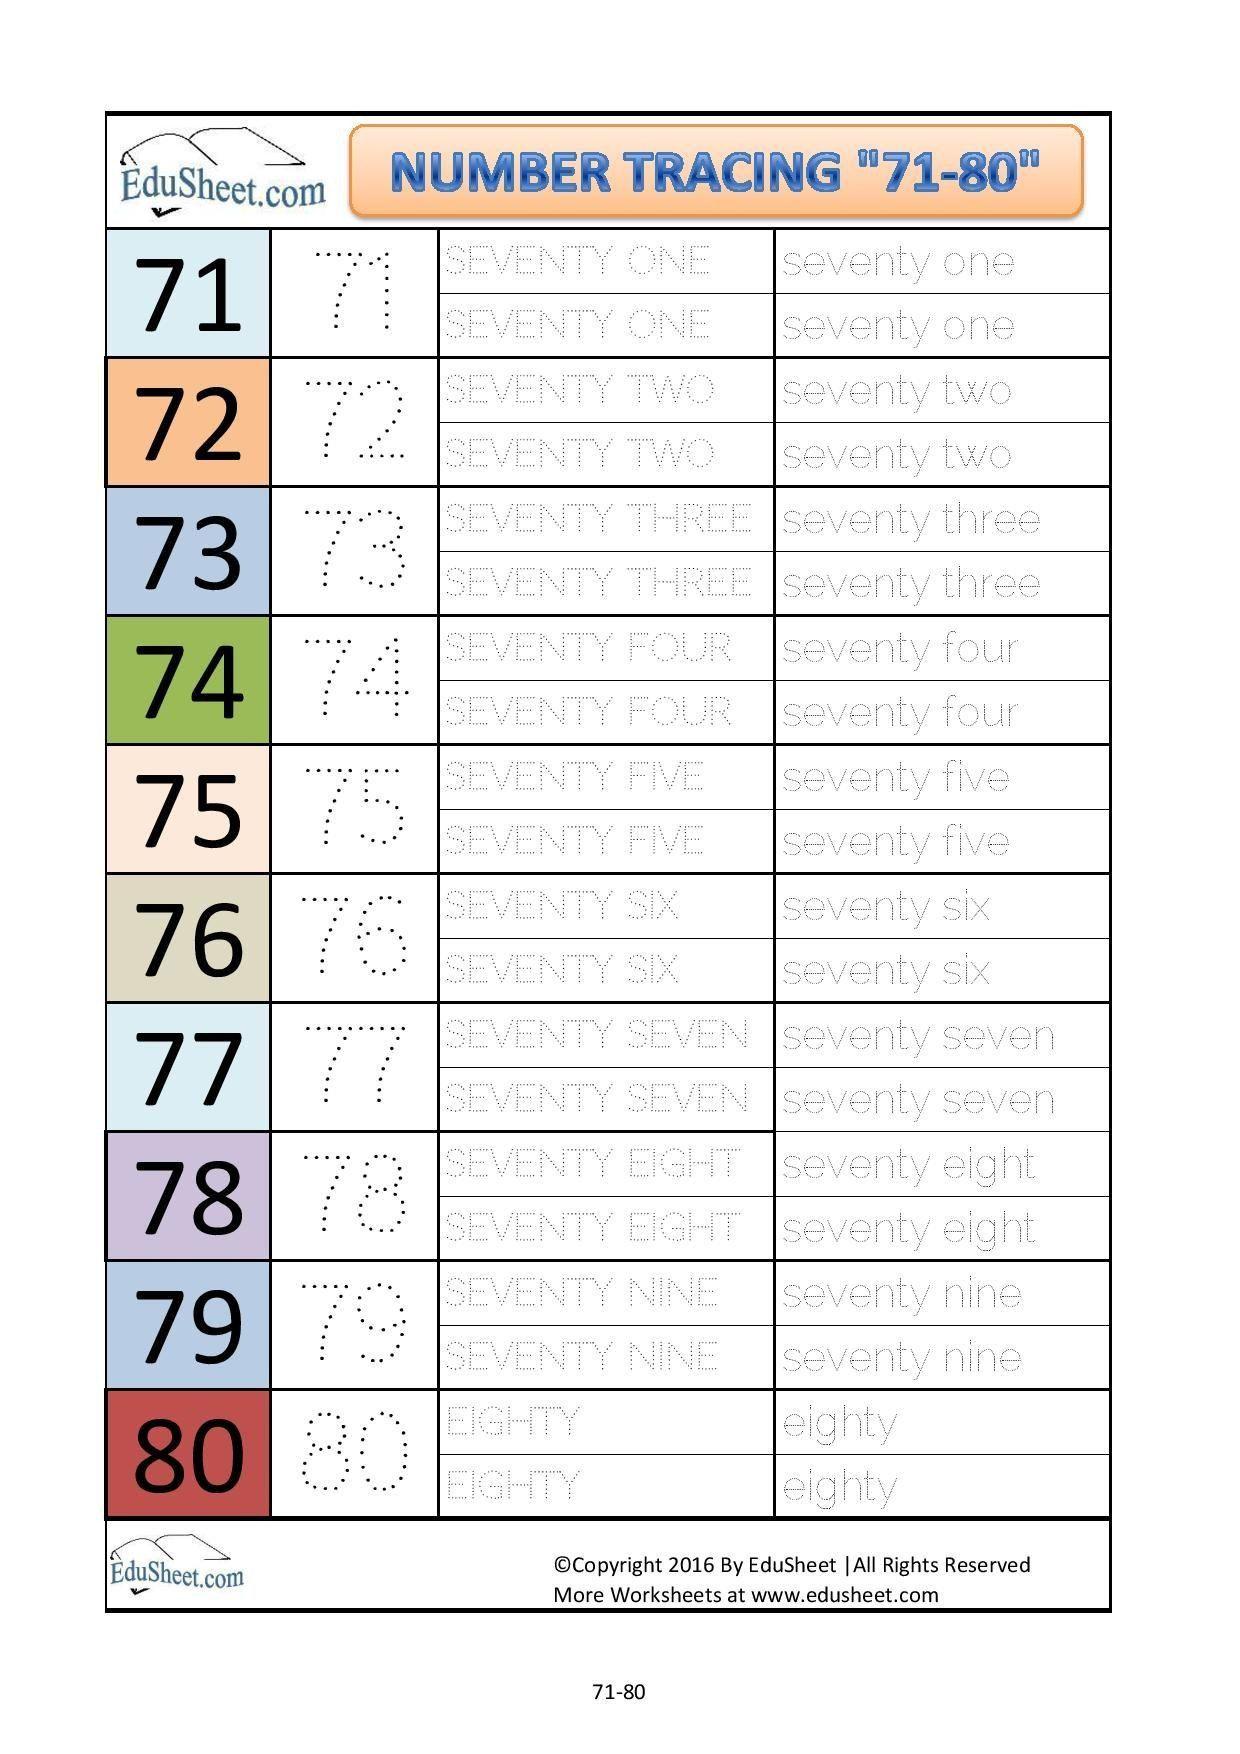 Number Tracing Worksheets Pdf Number Tracing Worksheets